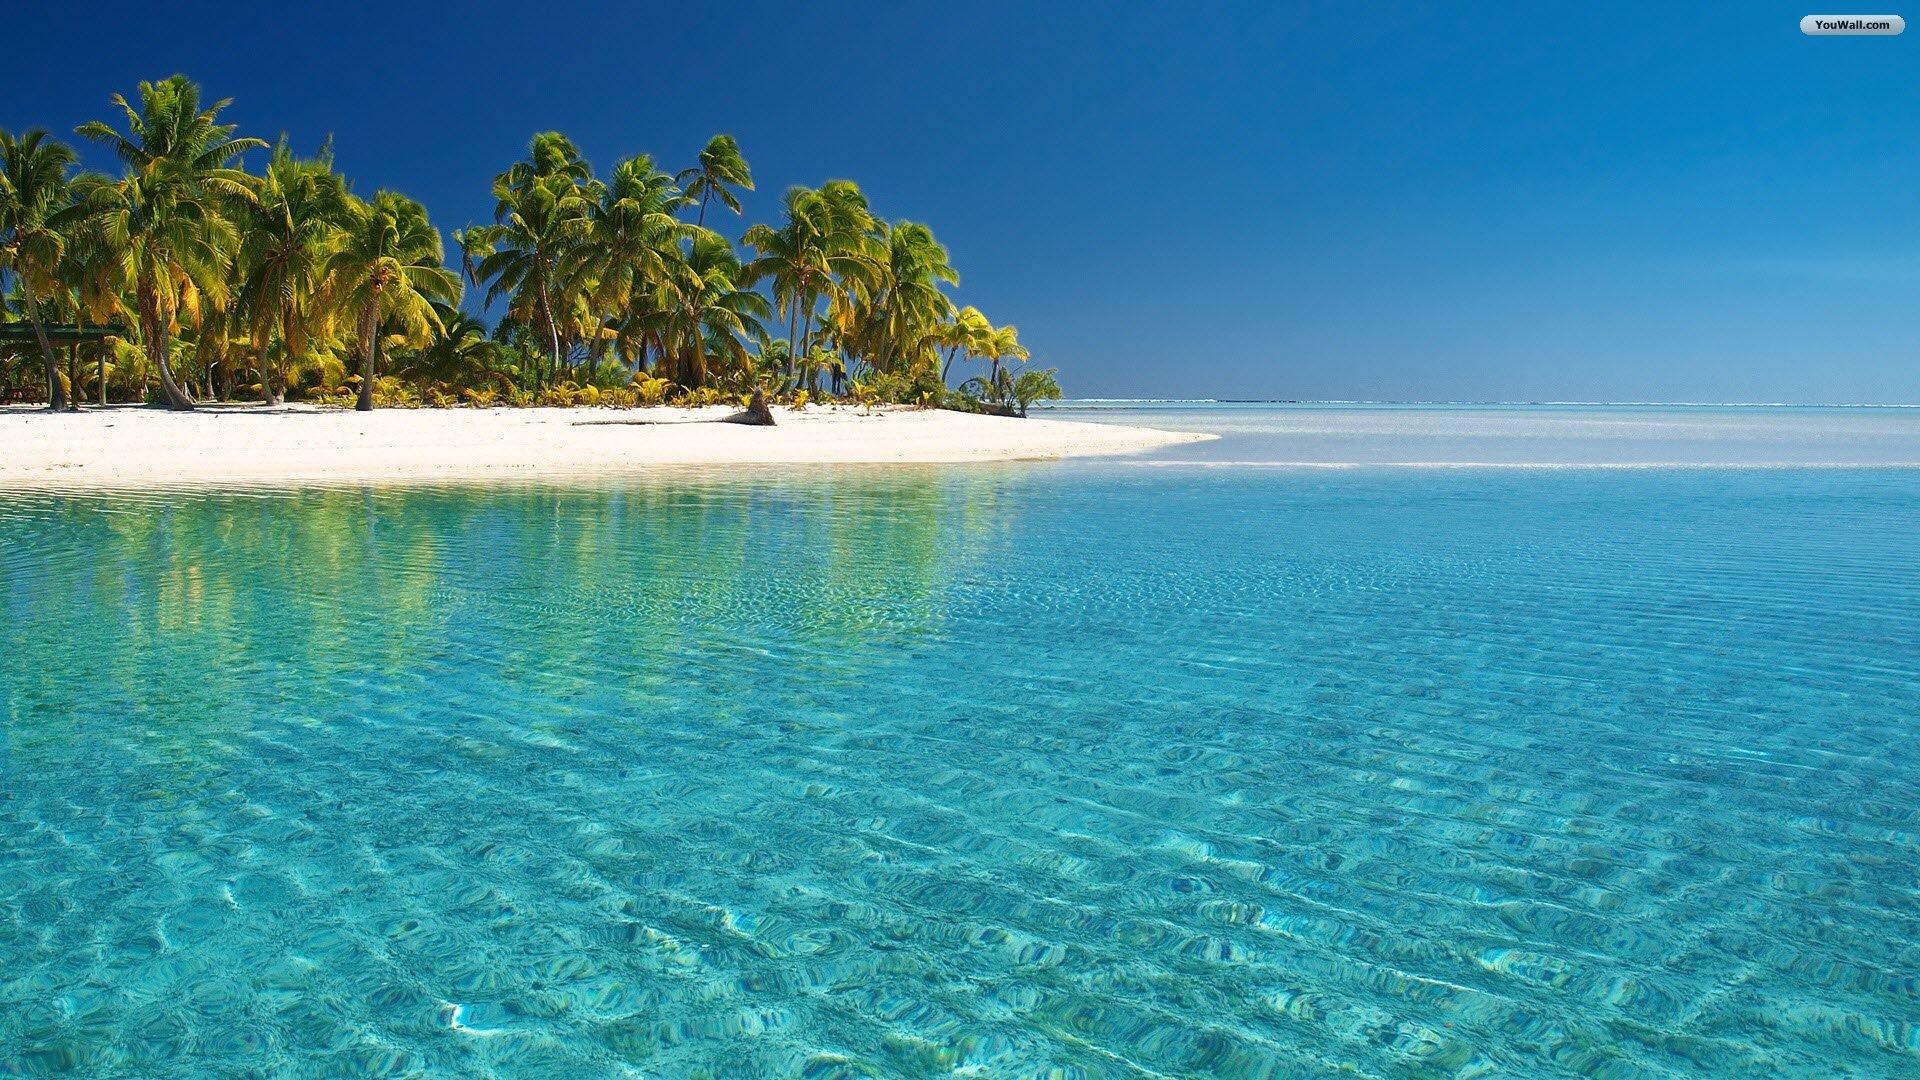 beach, tropical, wallpapers, paradise, island, glass, wallpaper, water